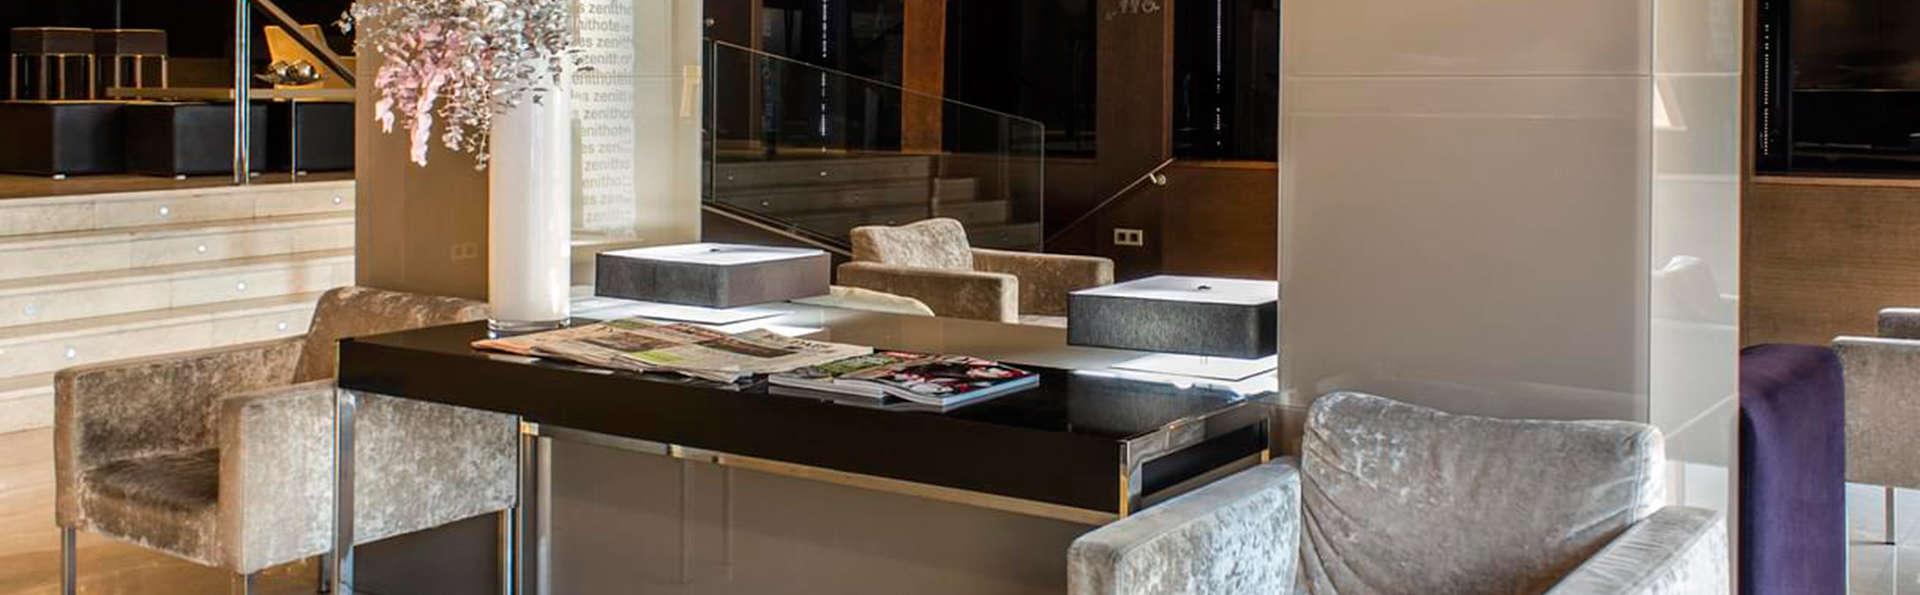 Hotel Zenit Valencia  - EDIT_lobby.jpg